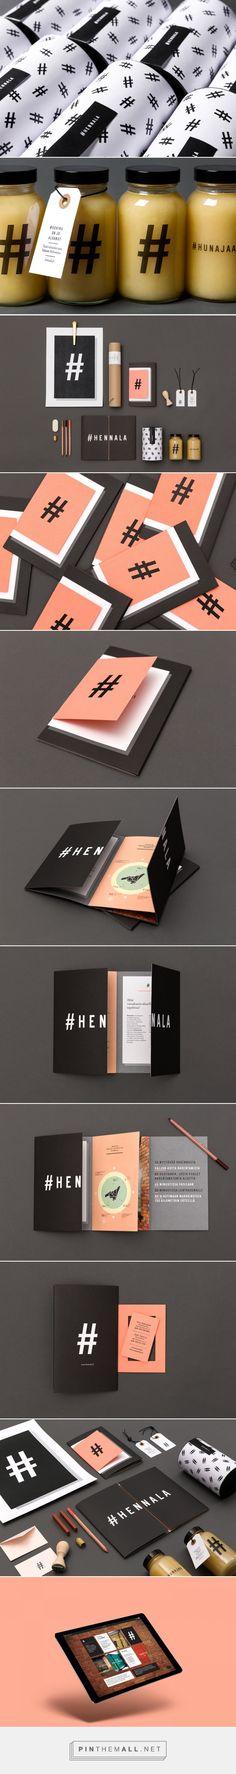 Hennala Visual Identity on Behance - created via https://pinthemall.net